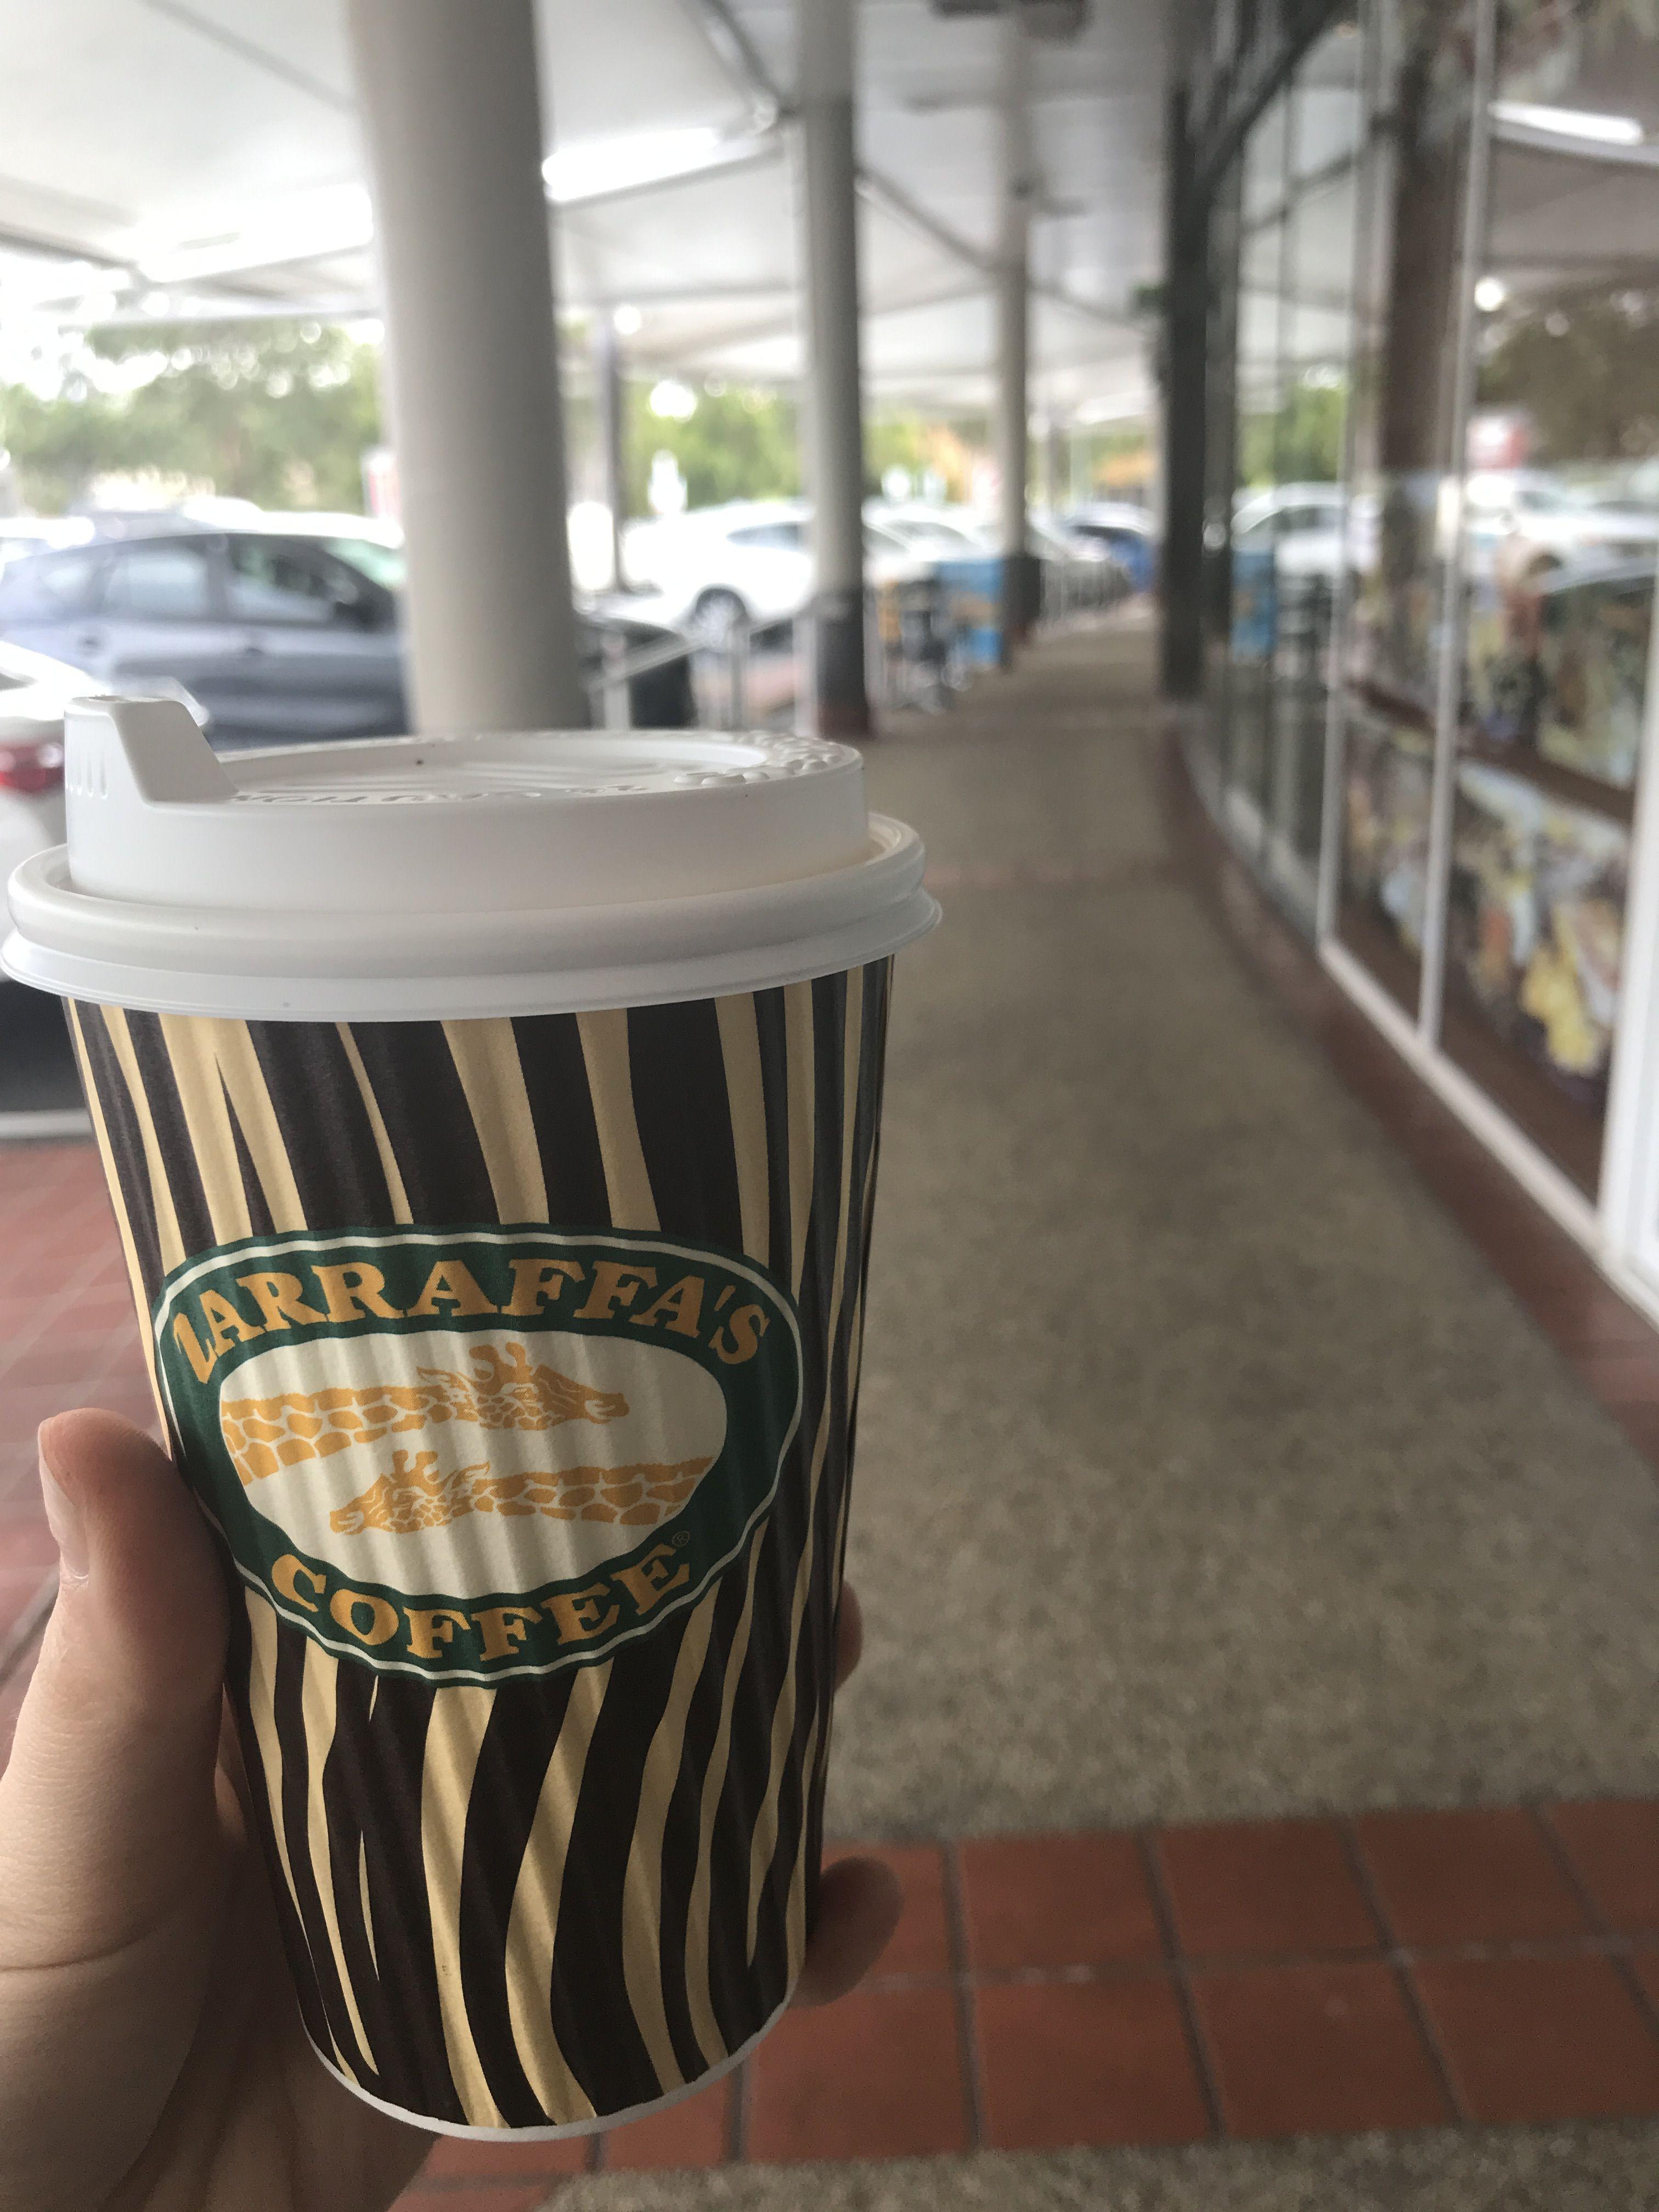 Zarraffa S Coffee Coffee Cups Trash Can Cup